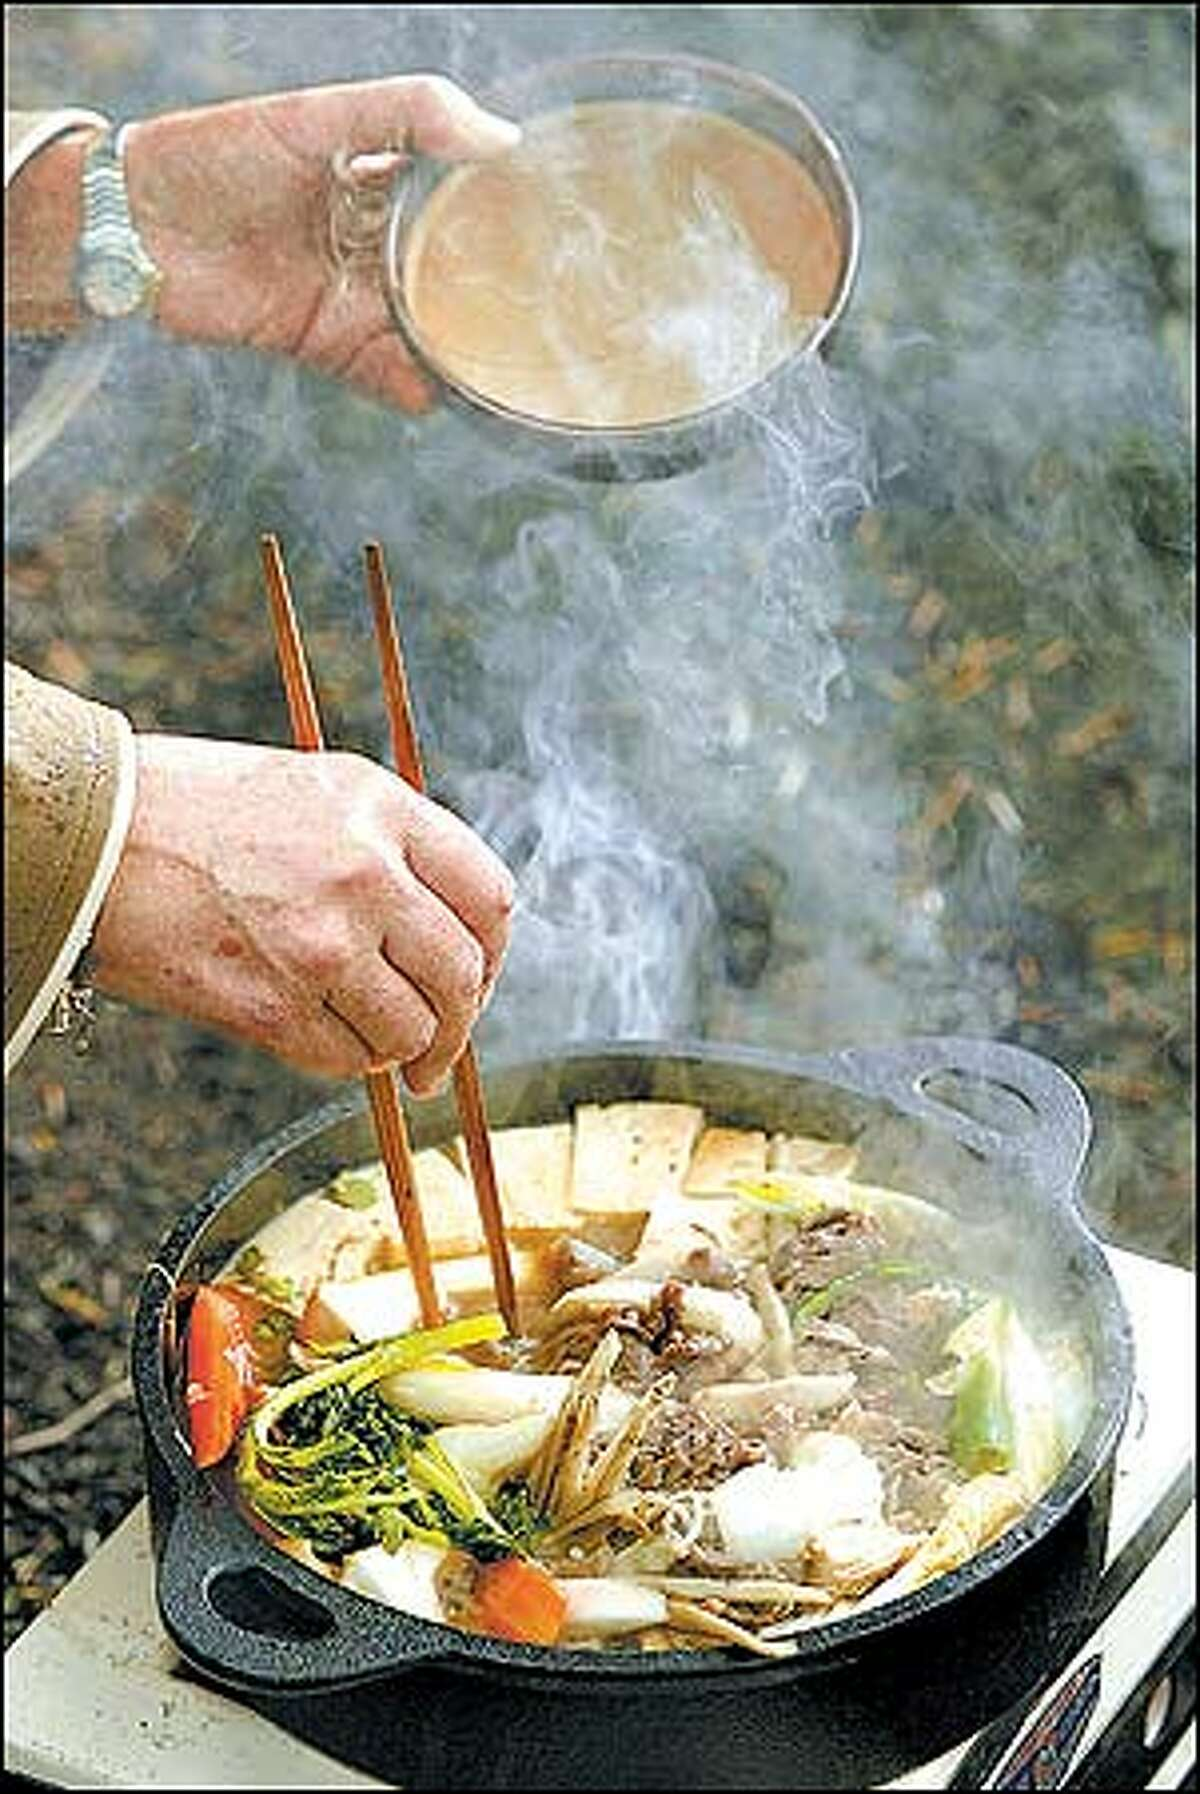 Hiroko Sugiyama makes sukiyaki from freshly picked Matsutaki mushrooms and other ingredients.